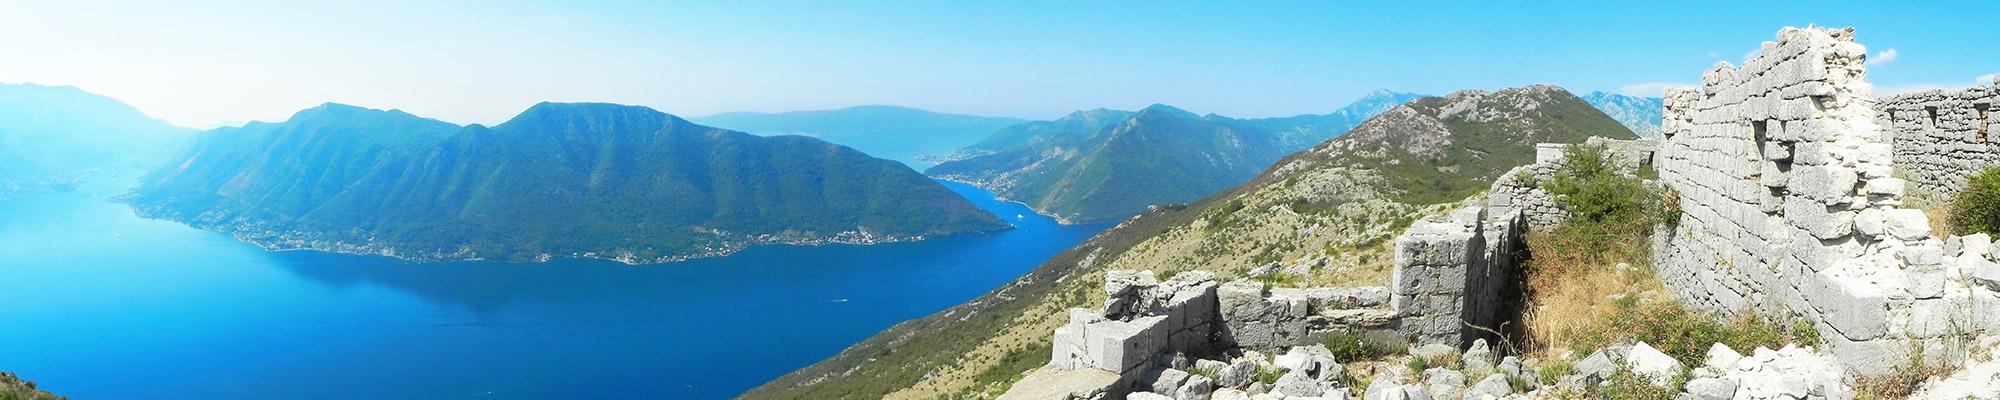 Montenegro_Kopf1